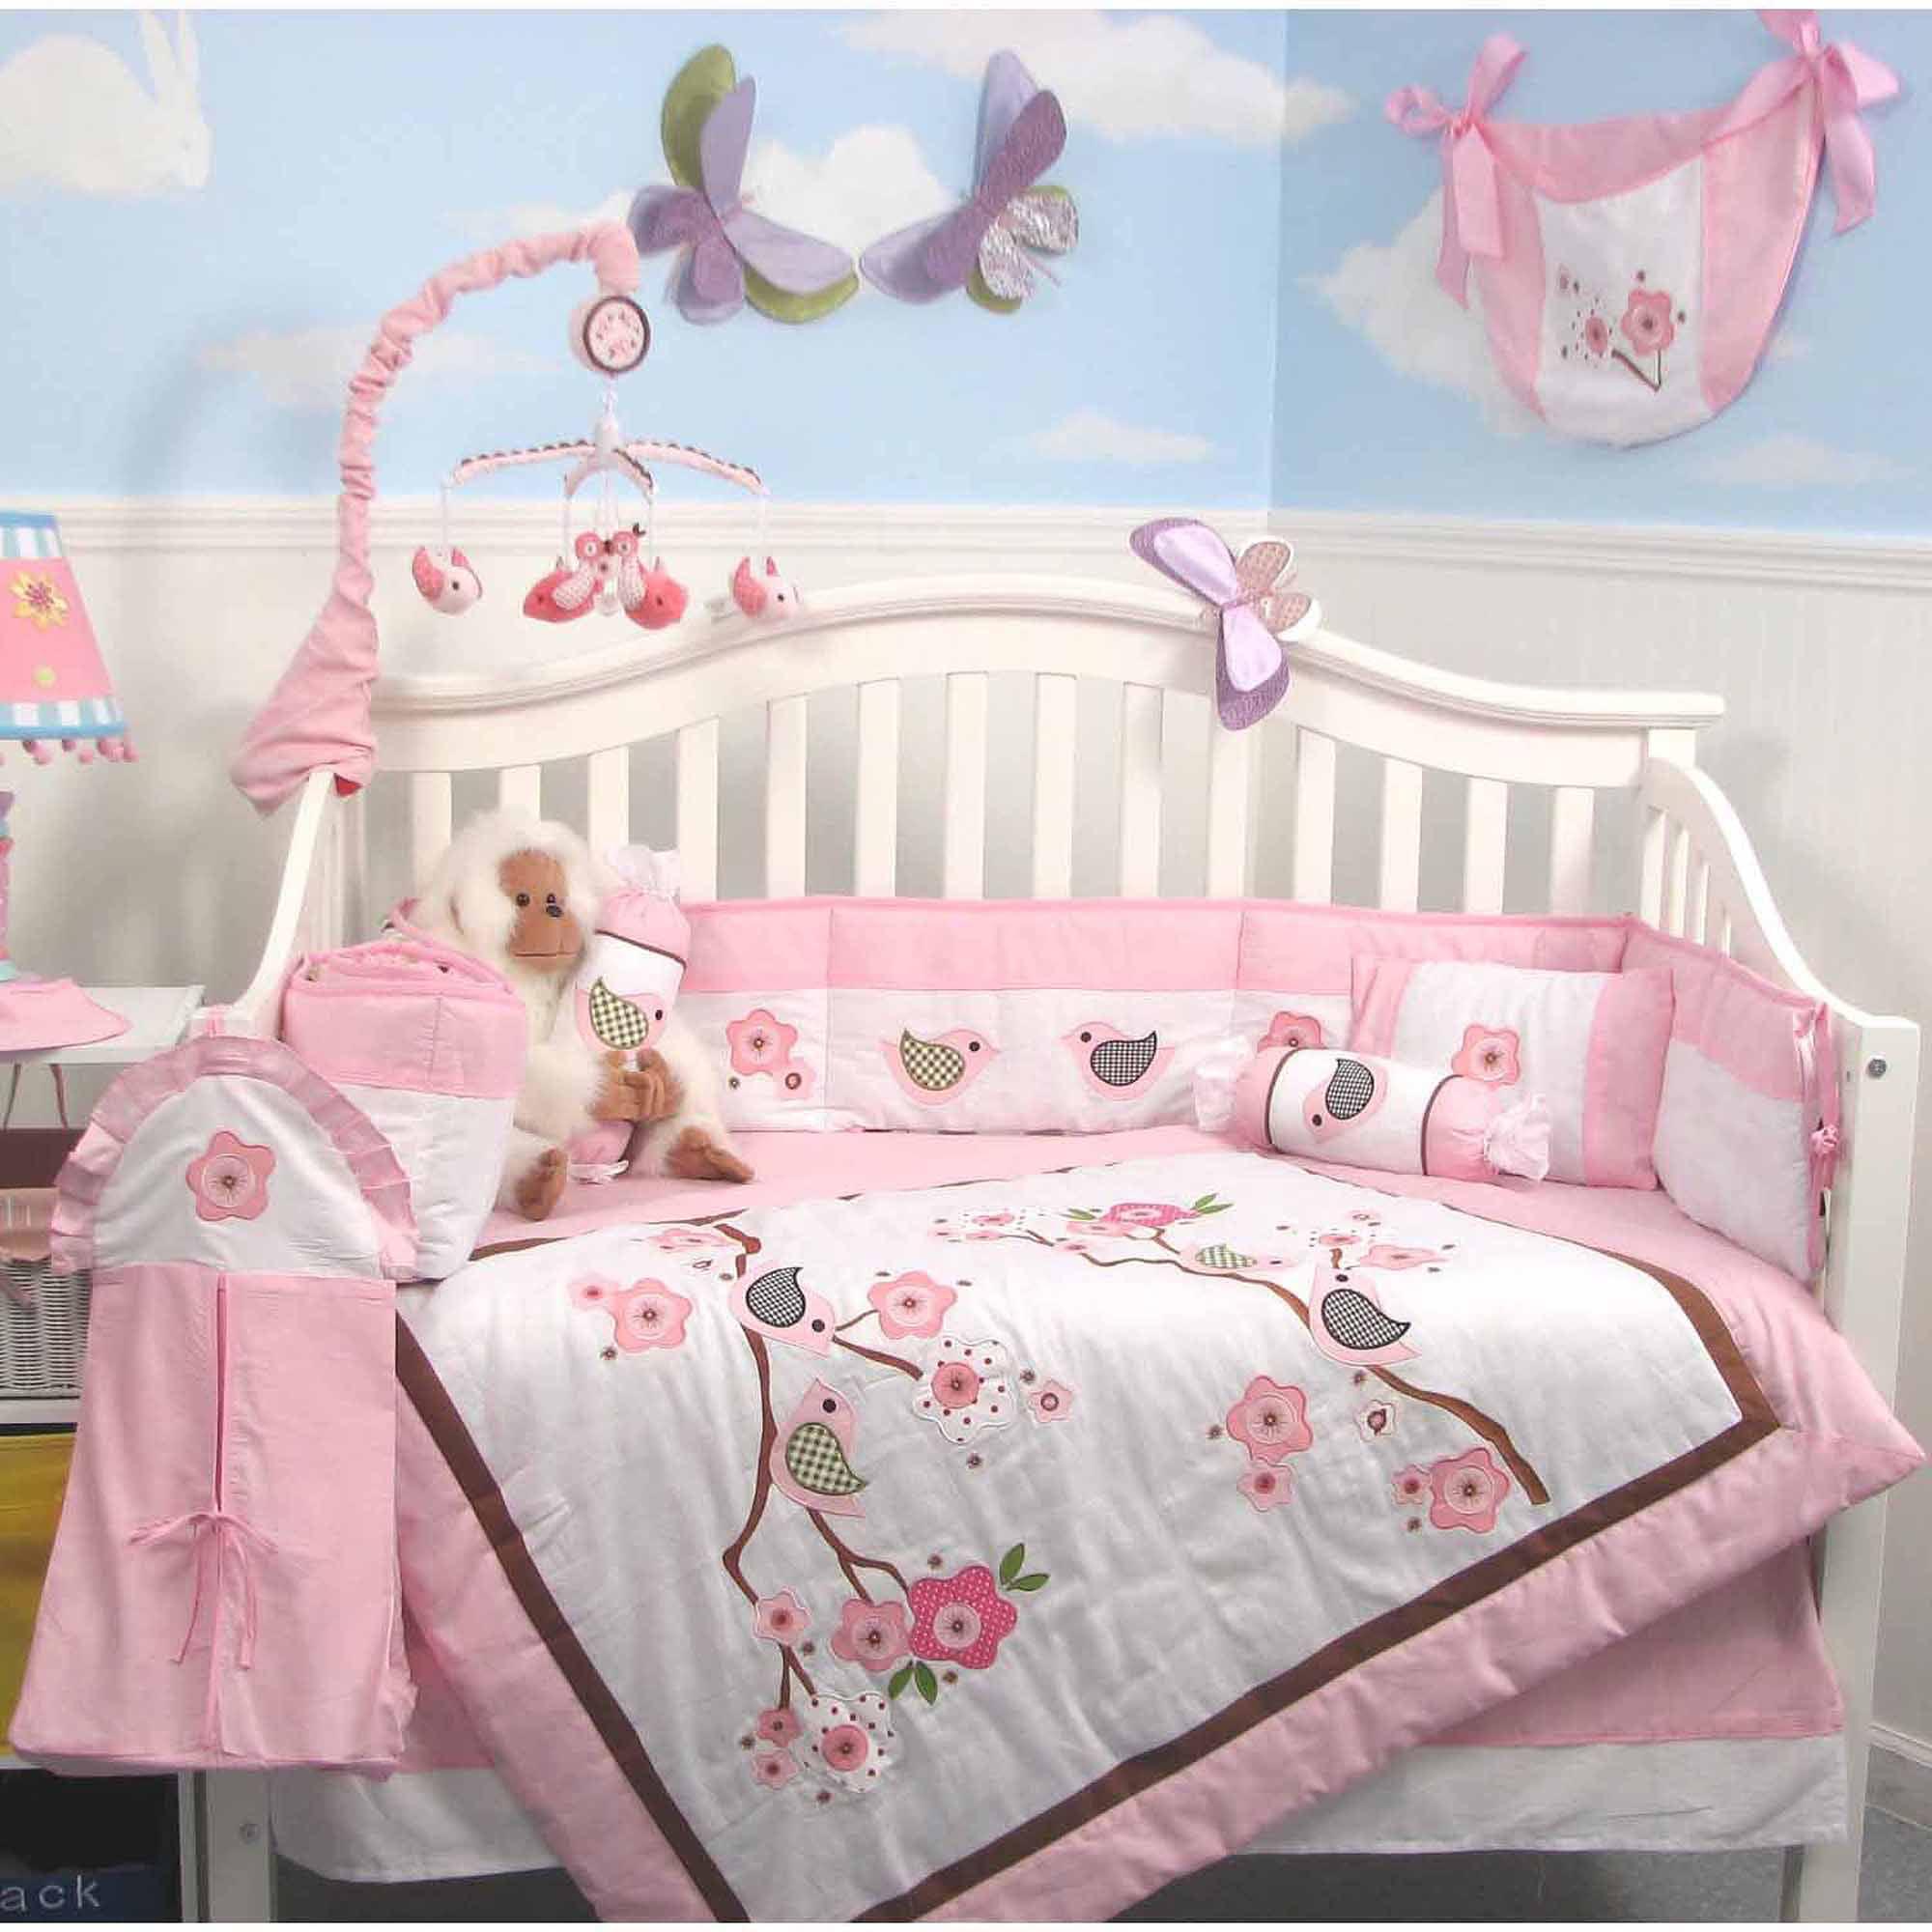 Soho Baby Crib Nursery Bedding 9 Piece